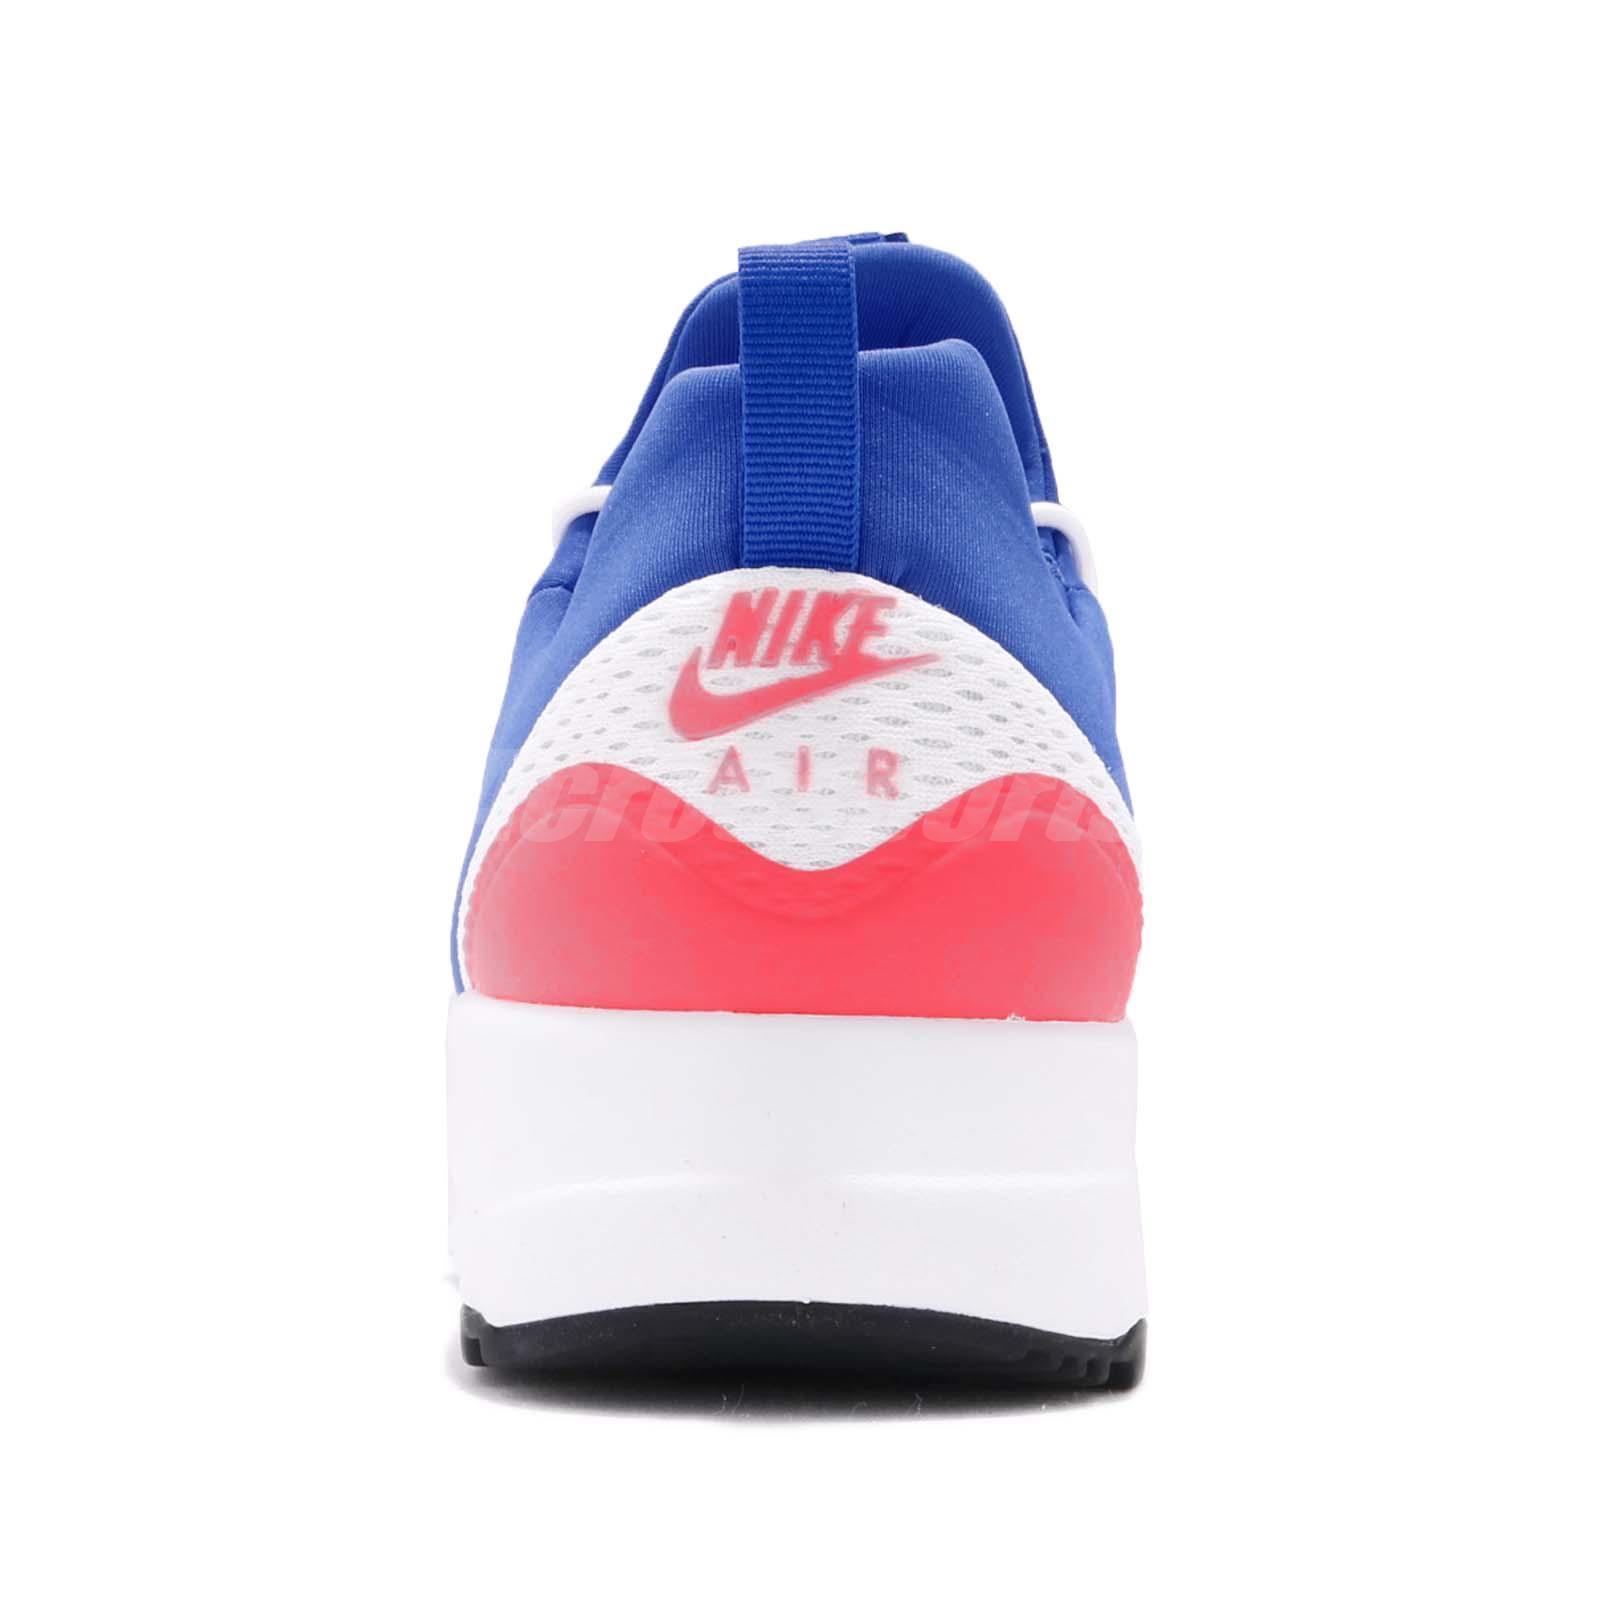 60a23b8c776 Nike Air Max Motion Racer White Ultramarine Solar Red Men Running ...